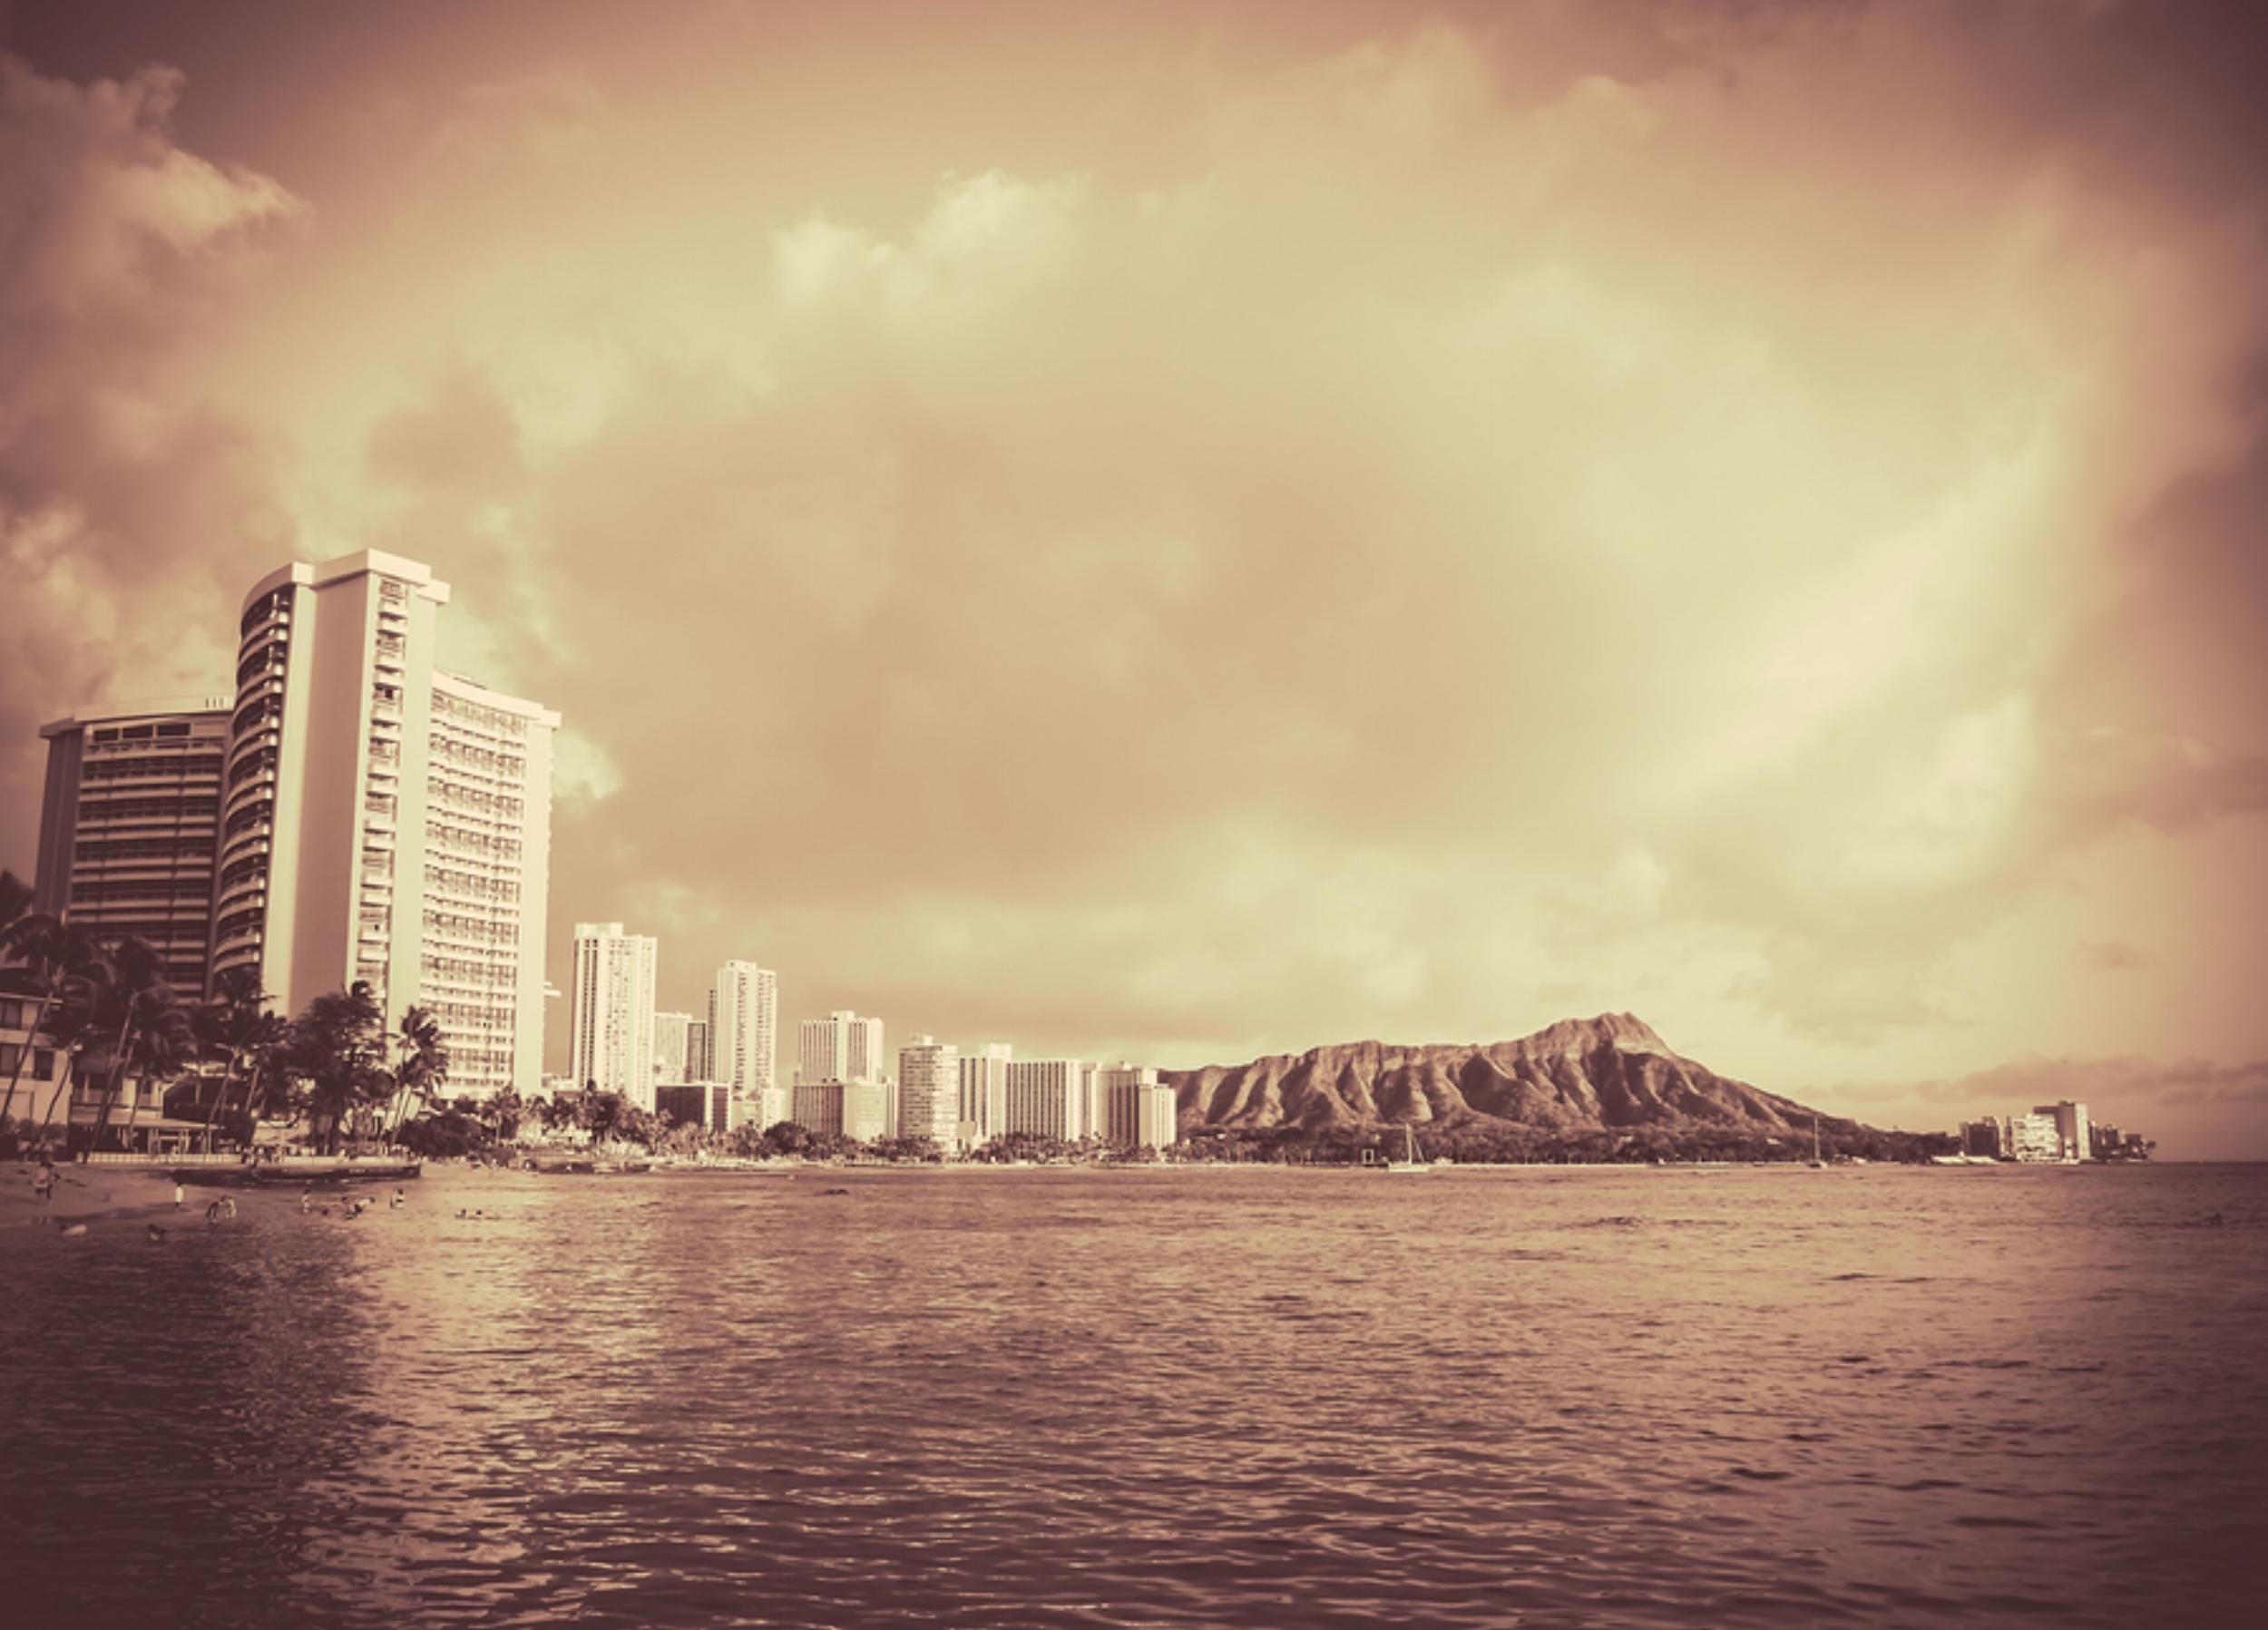 bigstock-Vintage-Photo-Of-Hawaii-Beach-61488416.jpg